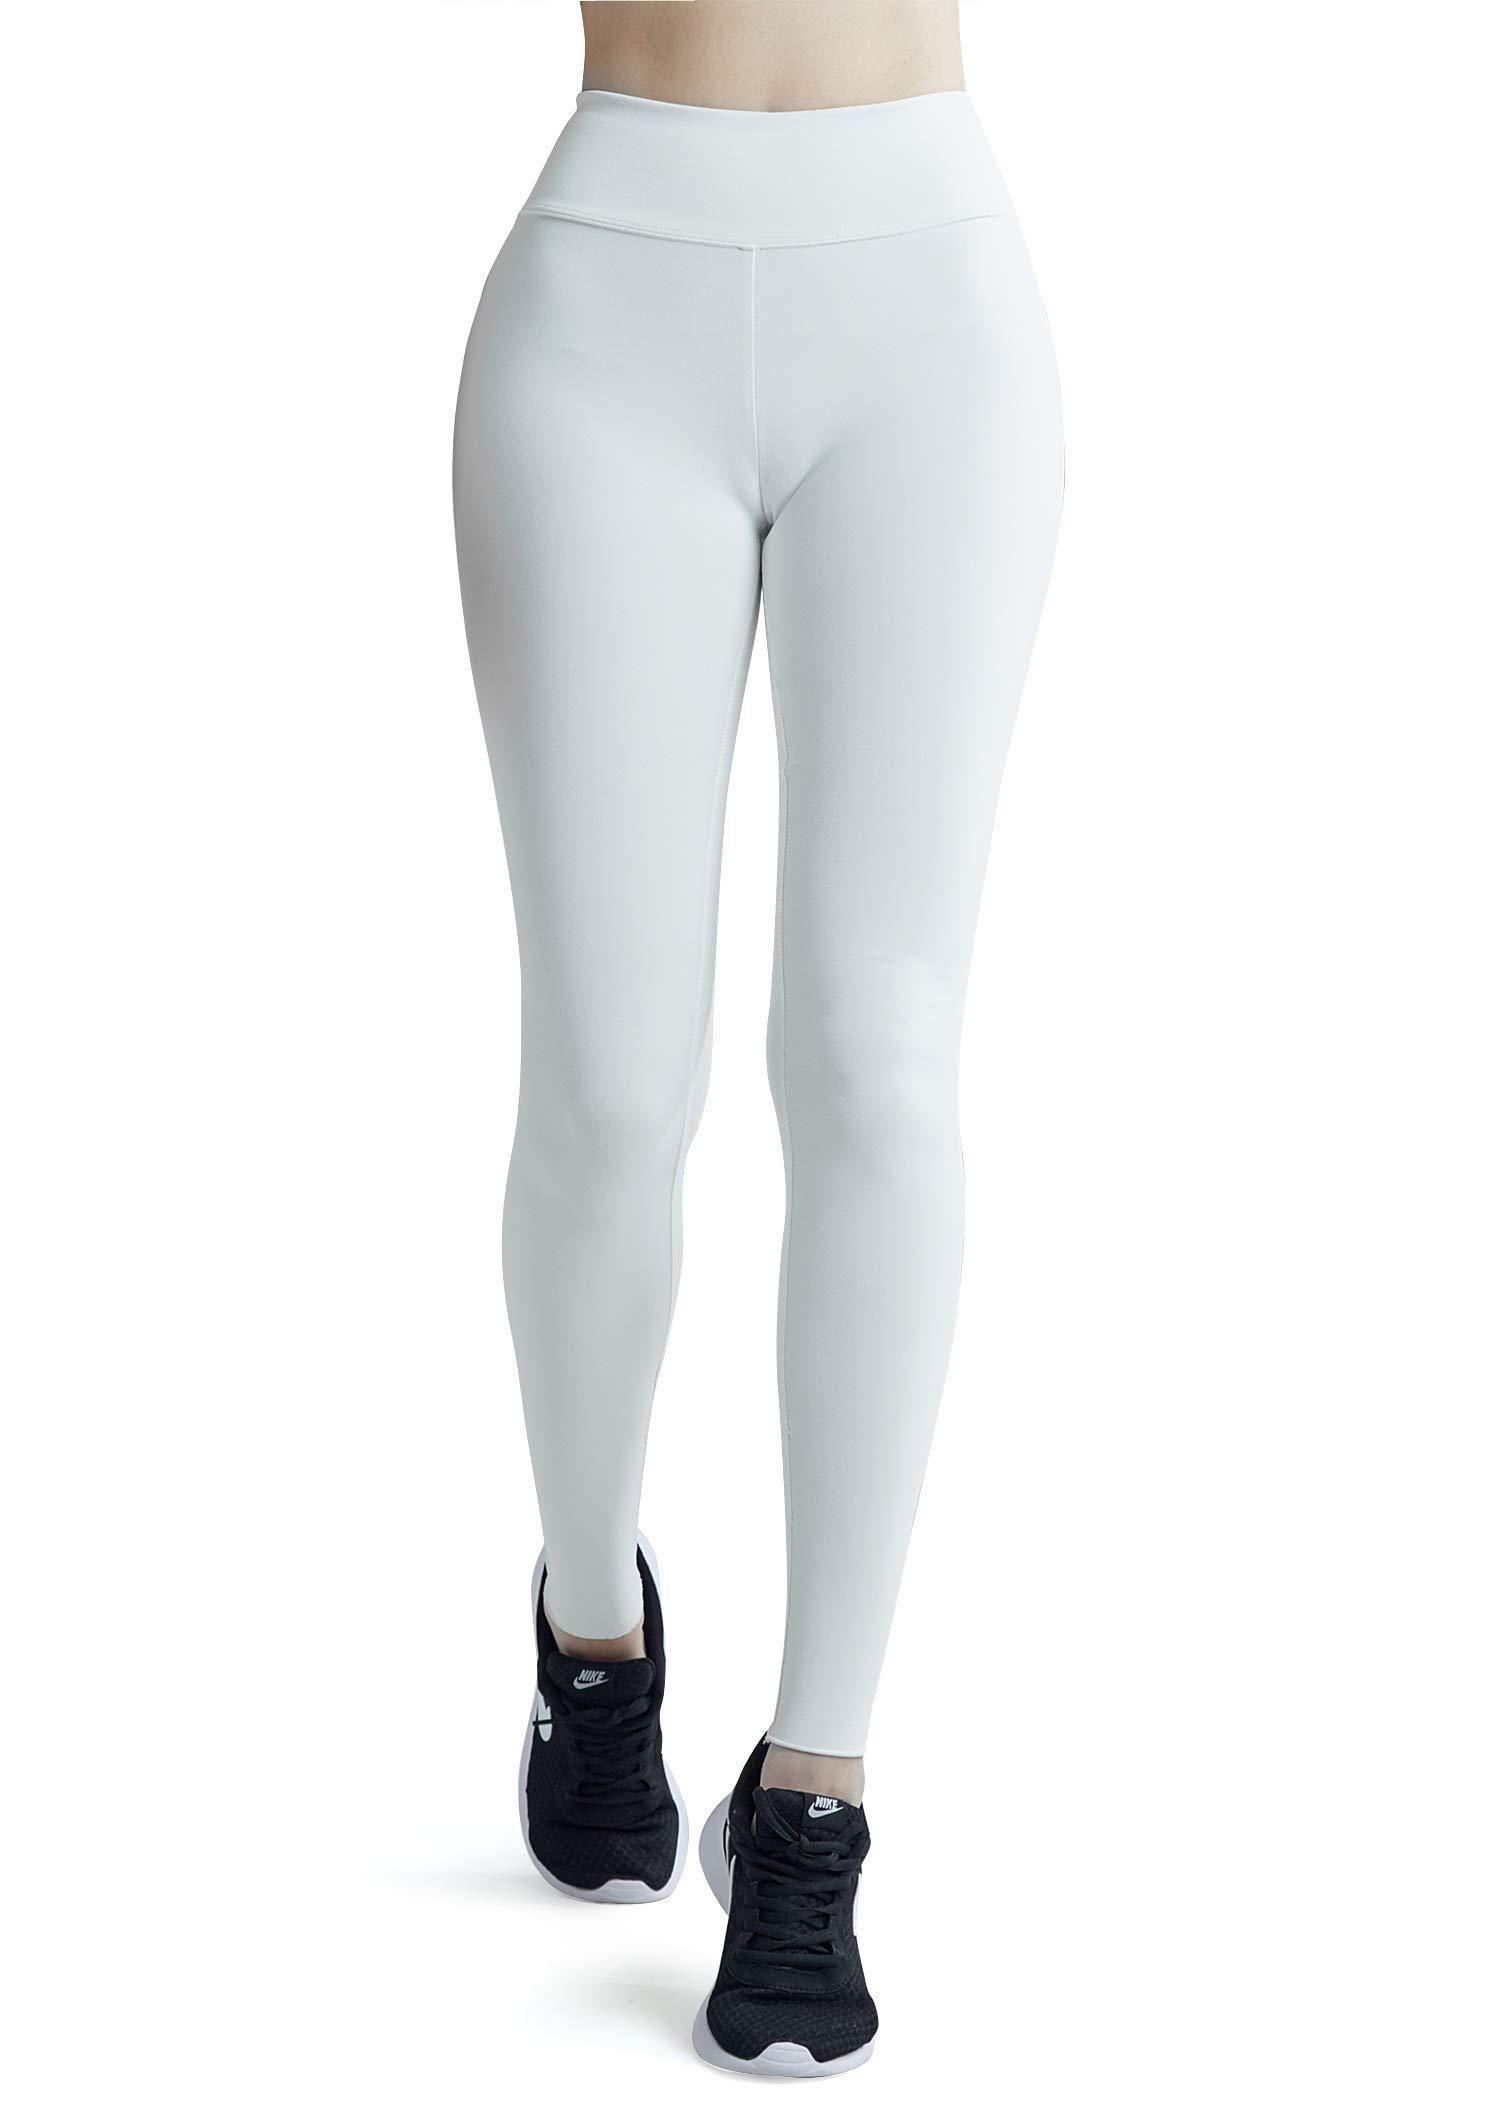 9190f44f766da Wirezoll Pantalon Yoga Taille Mi Haute Legging Sport Femme Fitness Gym  Pilates Pantalon de Sudation